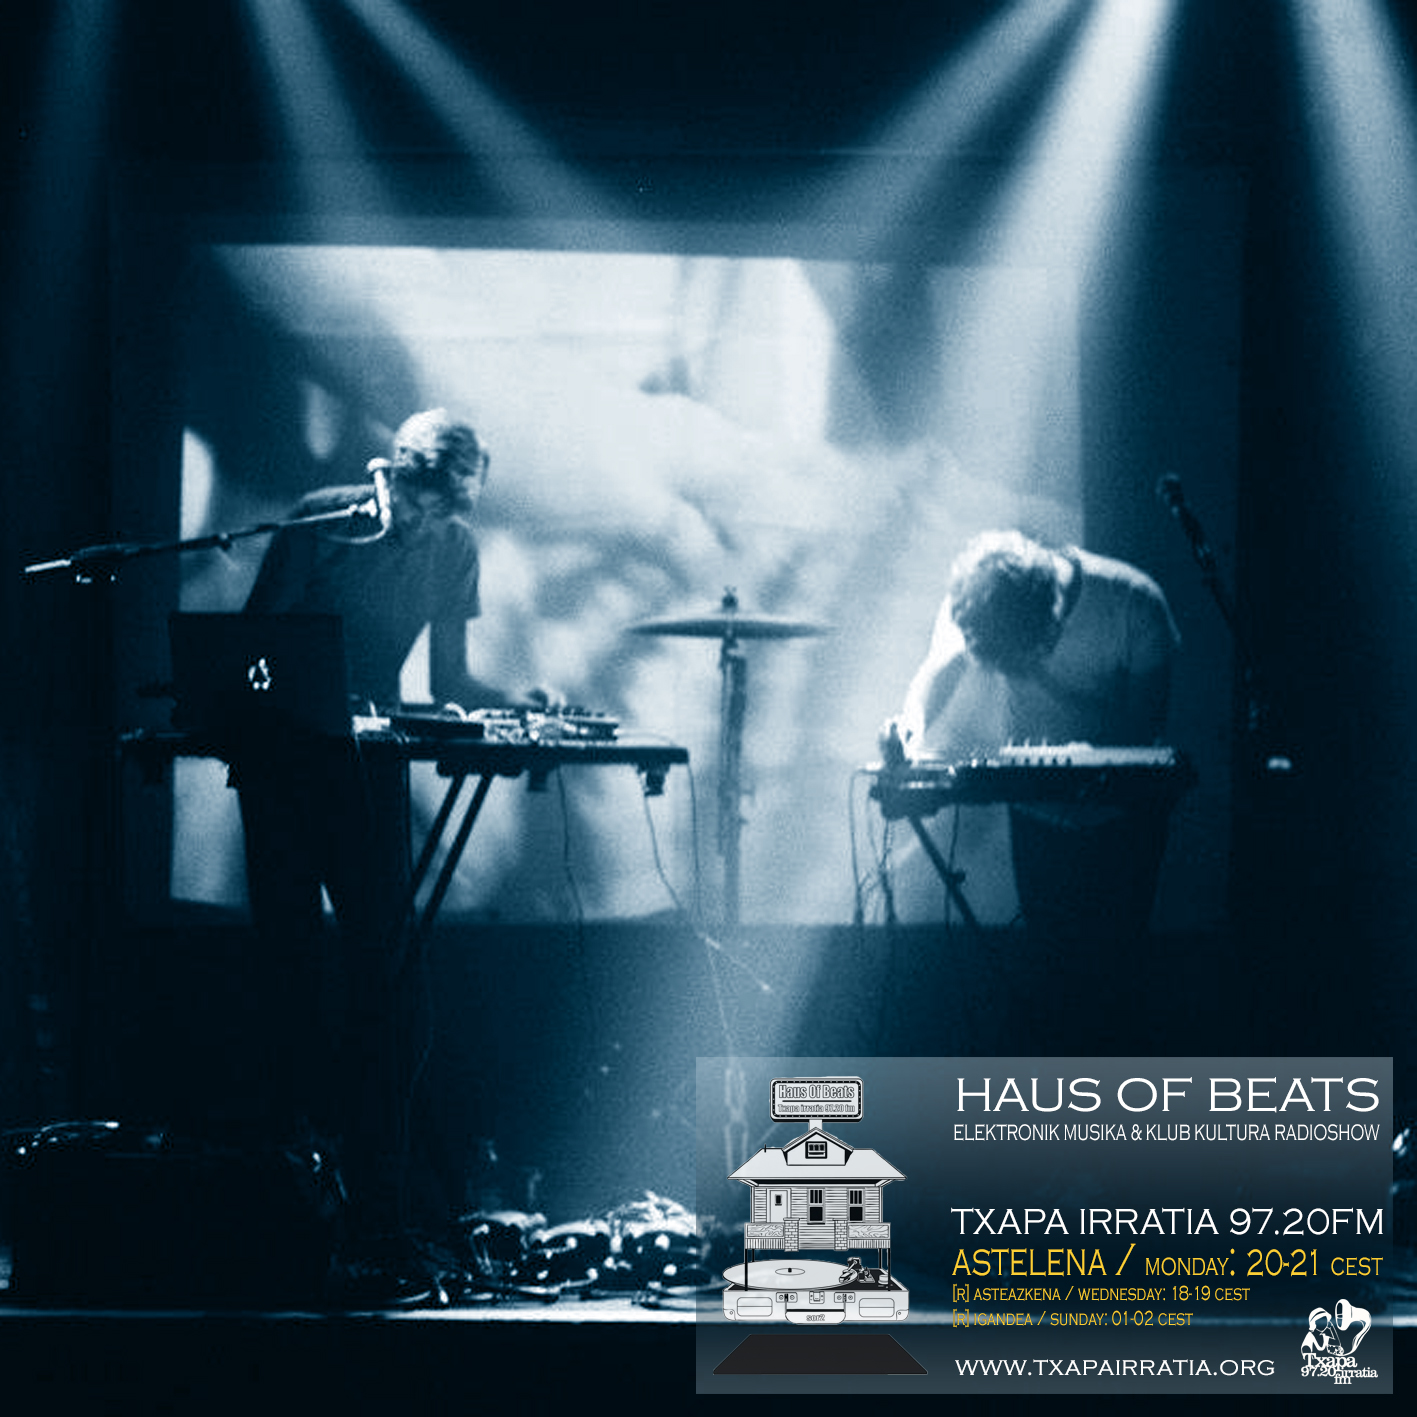 Haus of beats 69 txapa irratia fm - Haus 69 ...